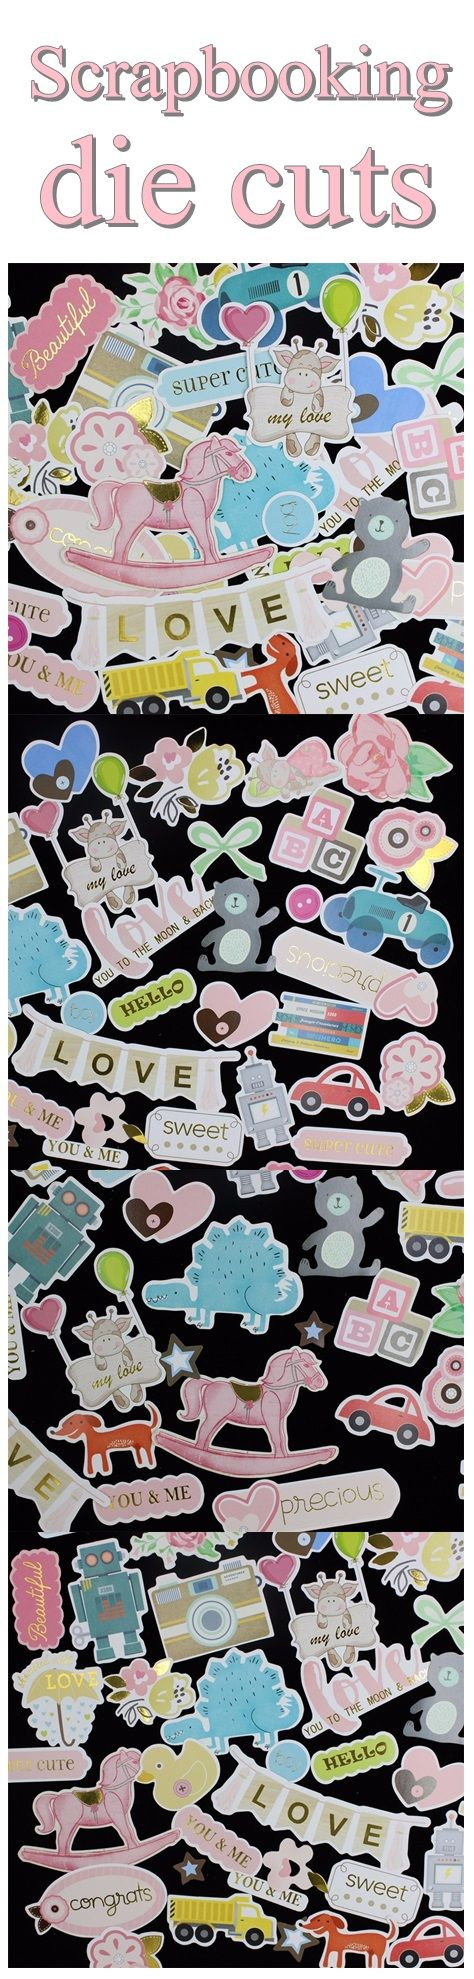 Scrapbook ideas cheap - Cheap Craft Supplies Scrapbooking Baby Die Cuts Card Making Embellishments